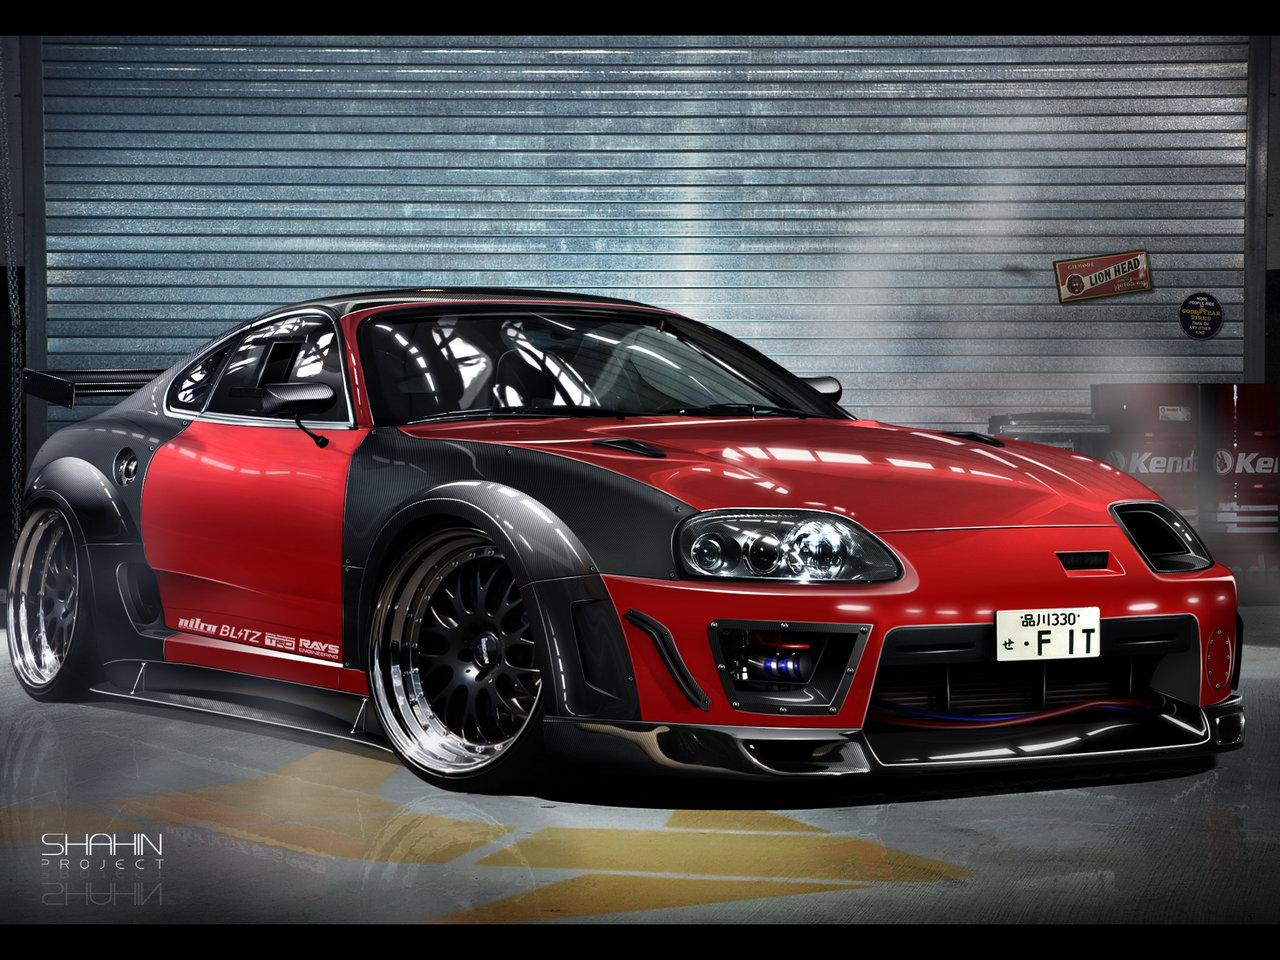 Toyota Supra Racing Exclusive HD Wallpapers 395 1280x960